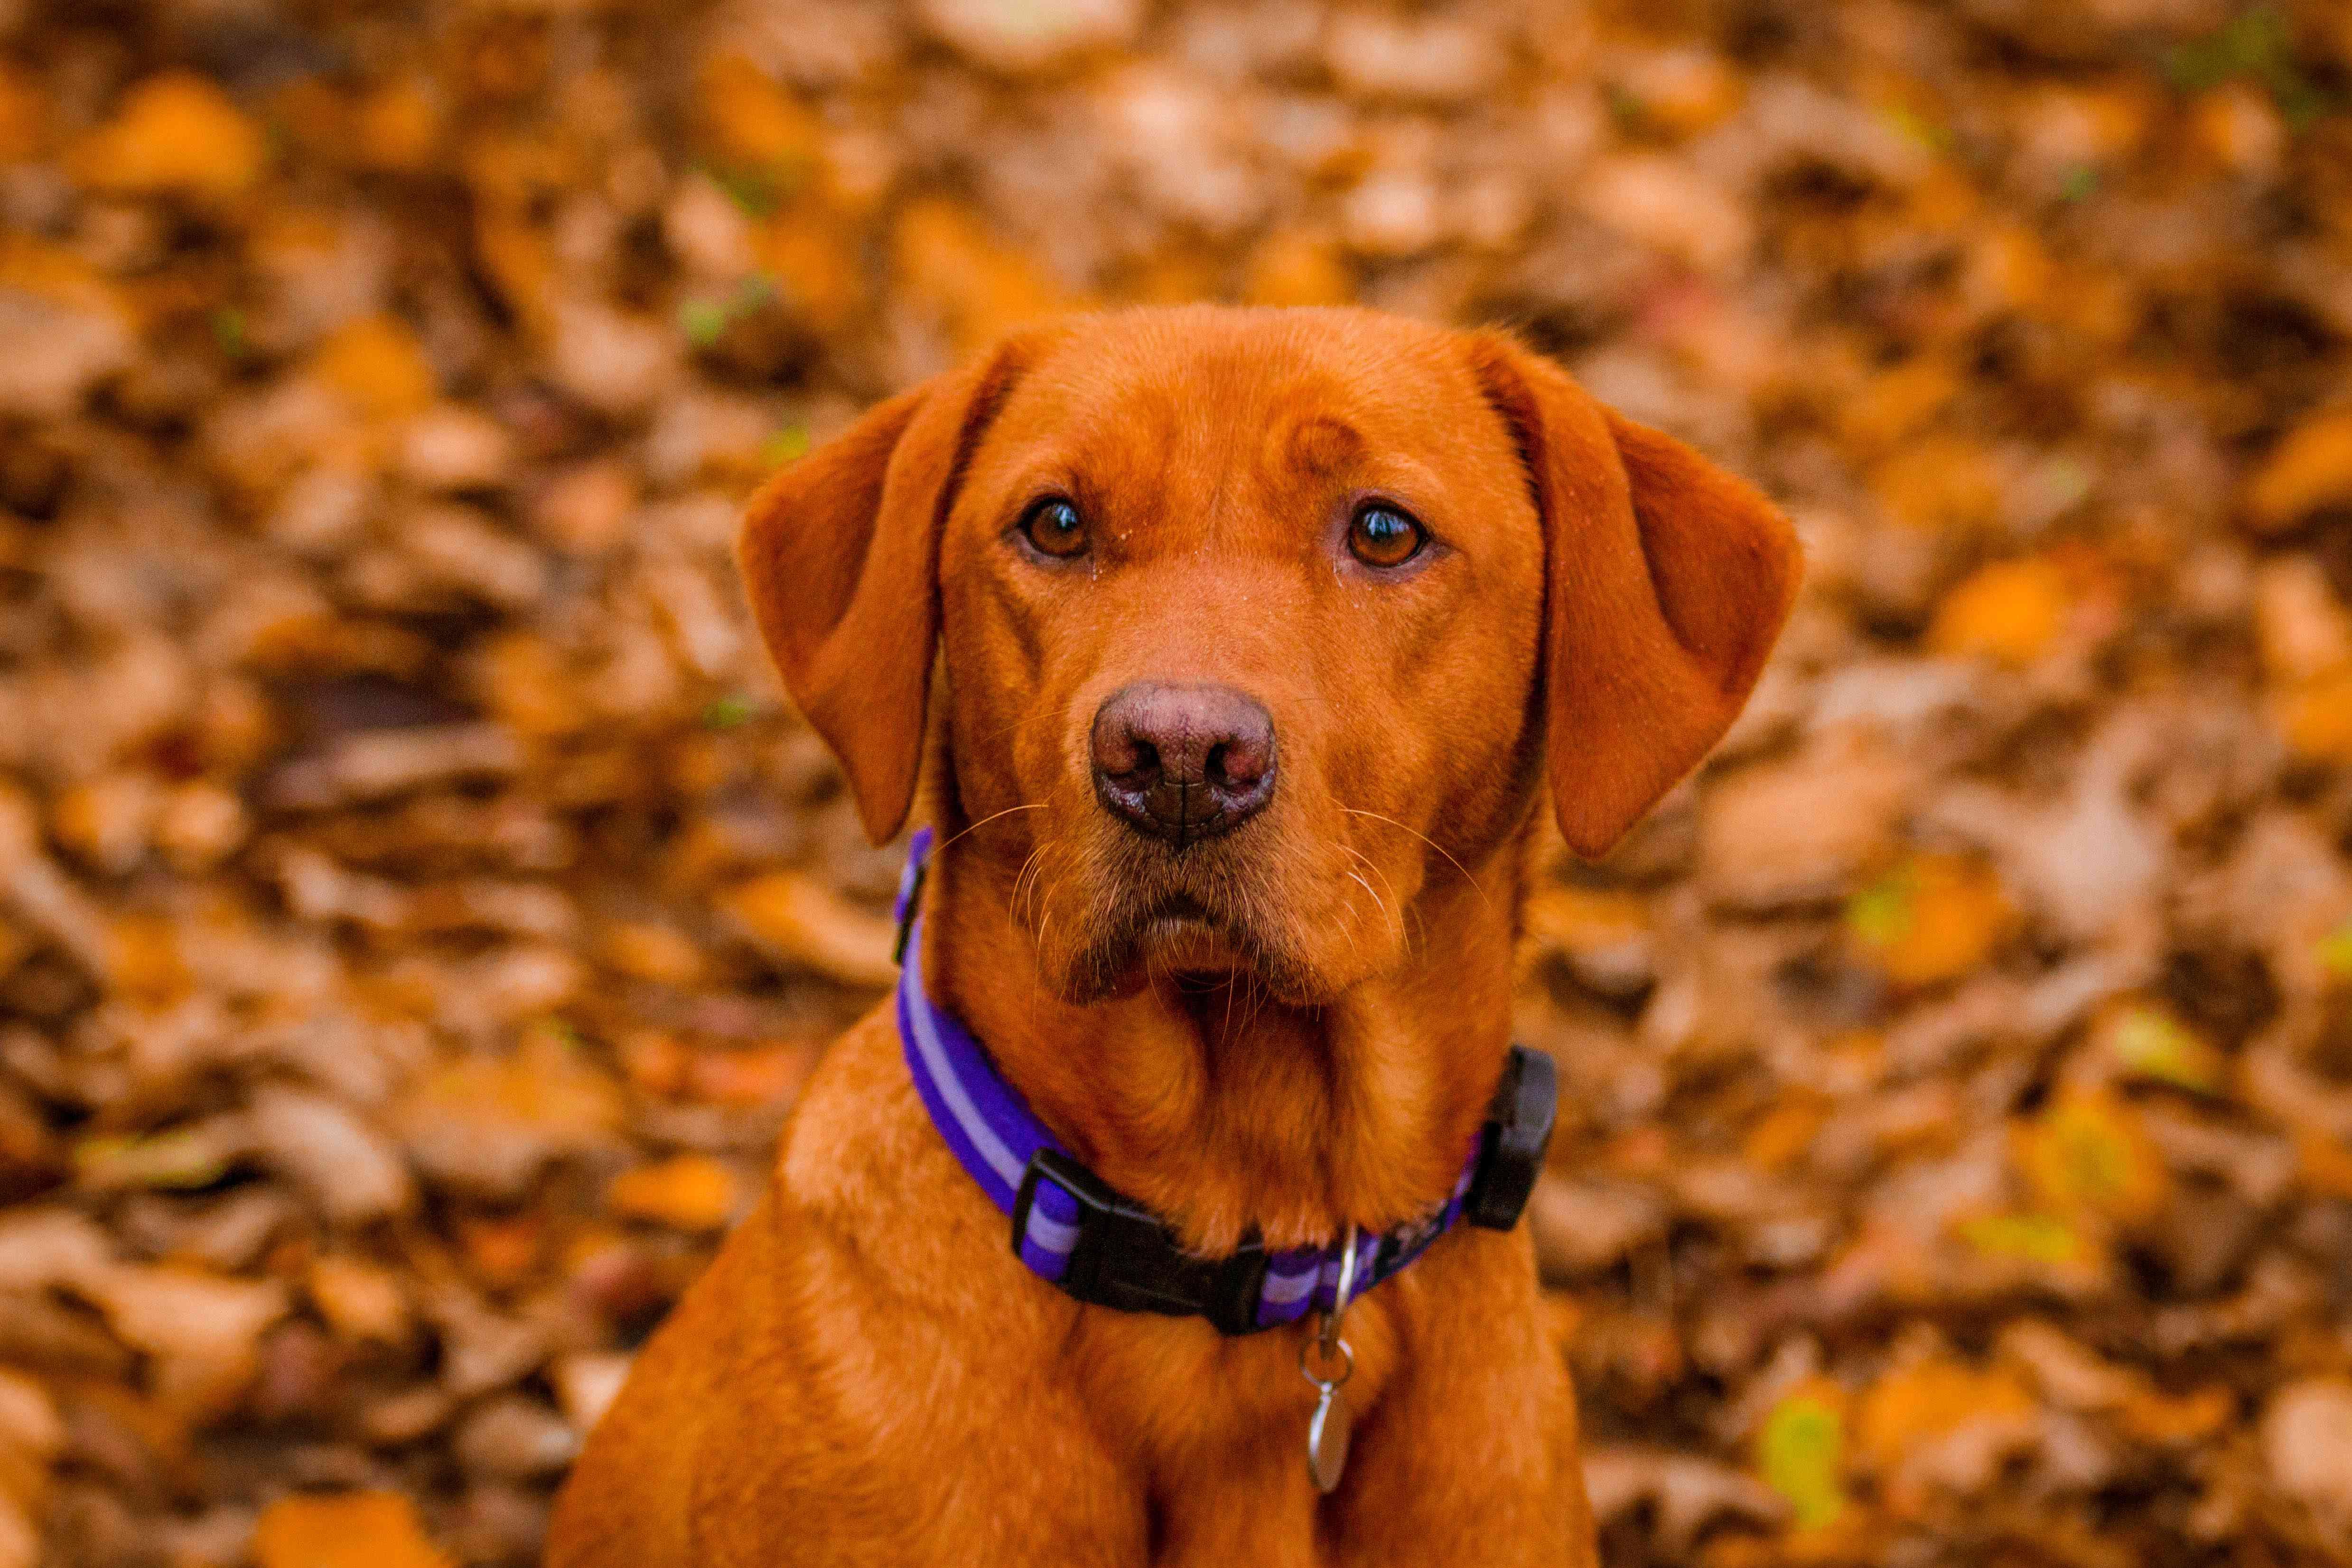 An Outdoor Portrait of a Fox-Red Labrador Retriever in Autumn